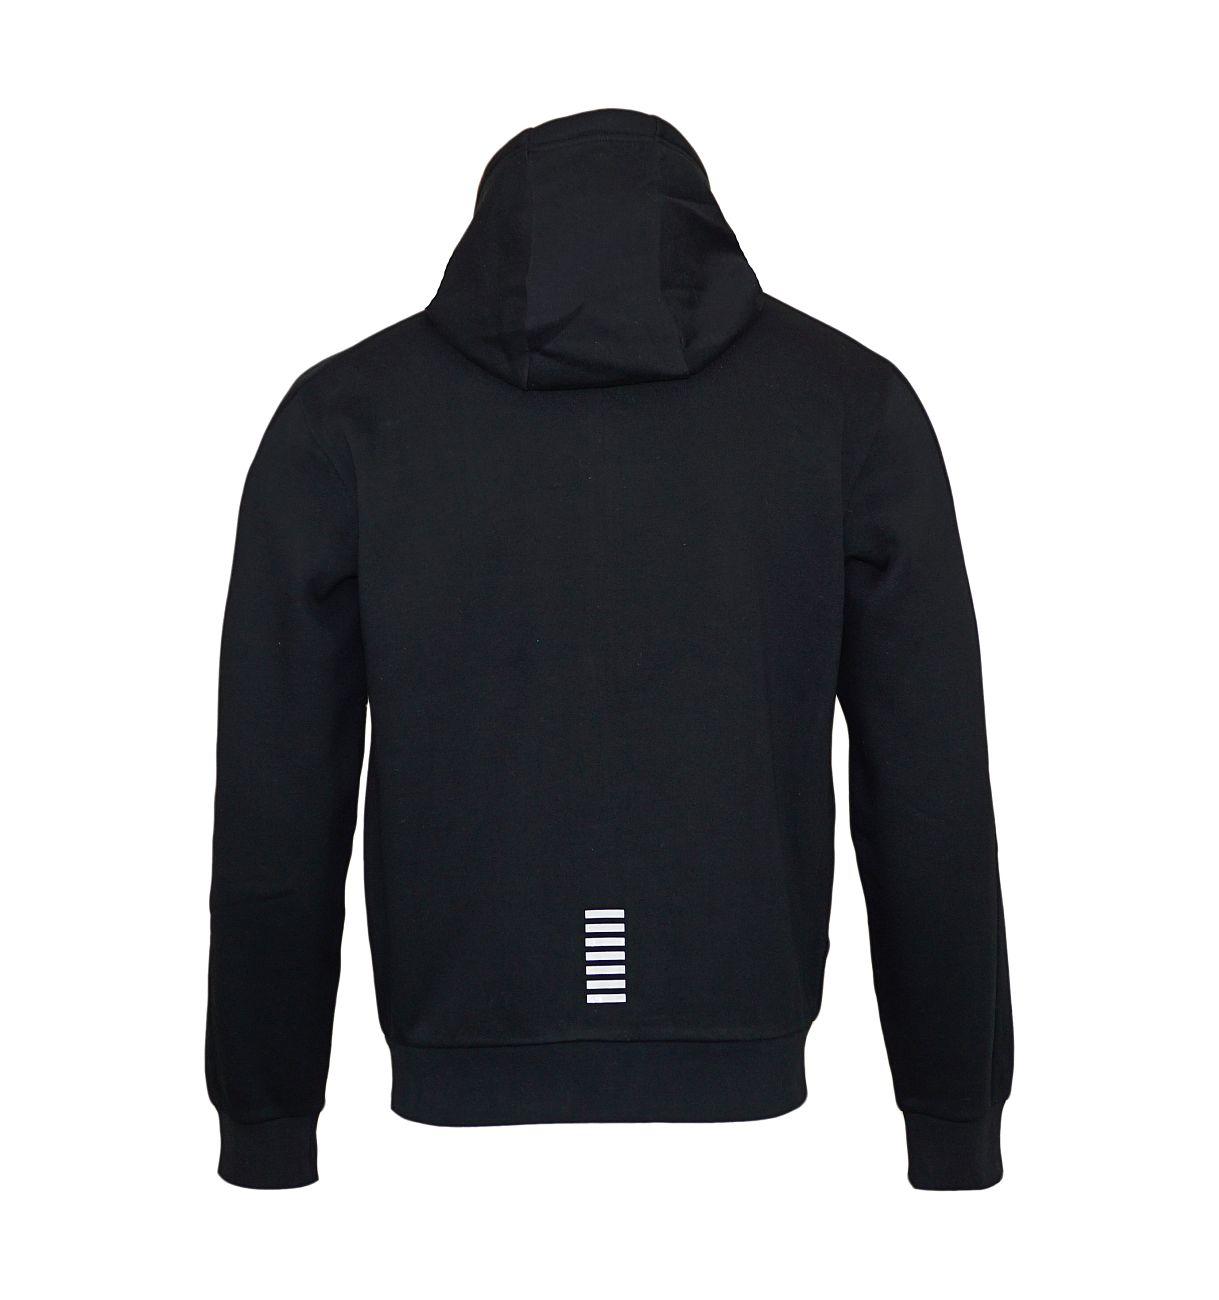 EA7 Emporio Armani Sweatshirt Jacke Hoodie 6YPM59 PJ07Z 1200 Black SH18-EA7S